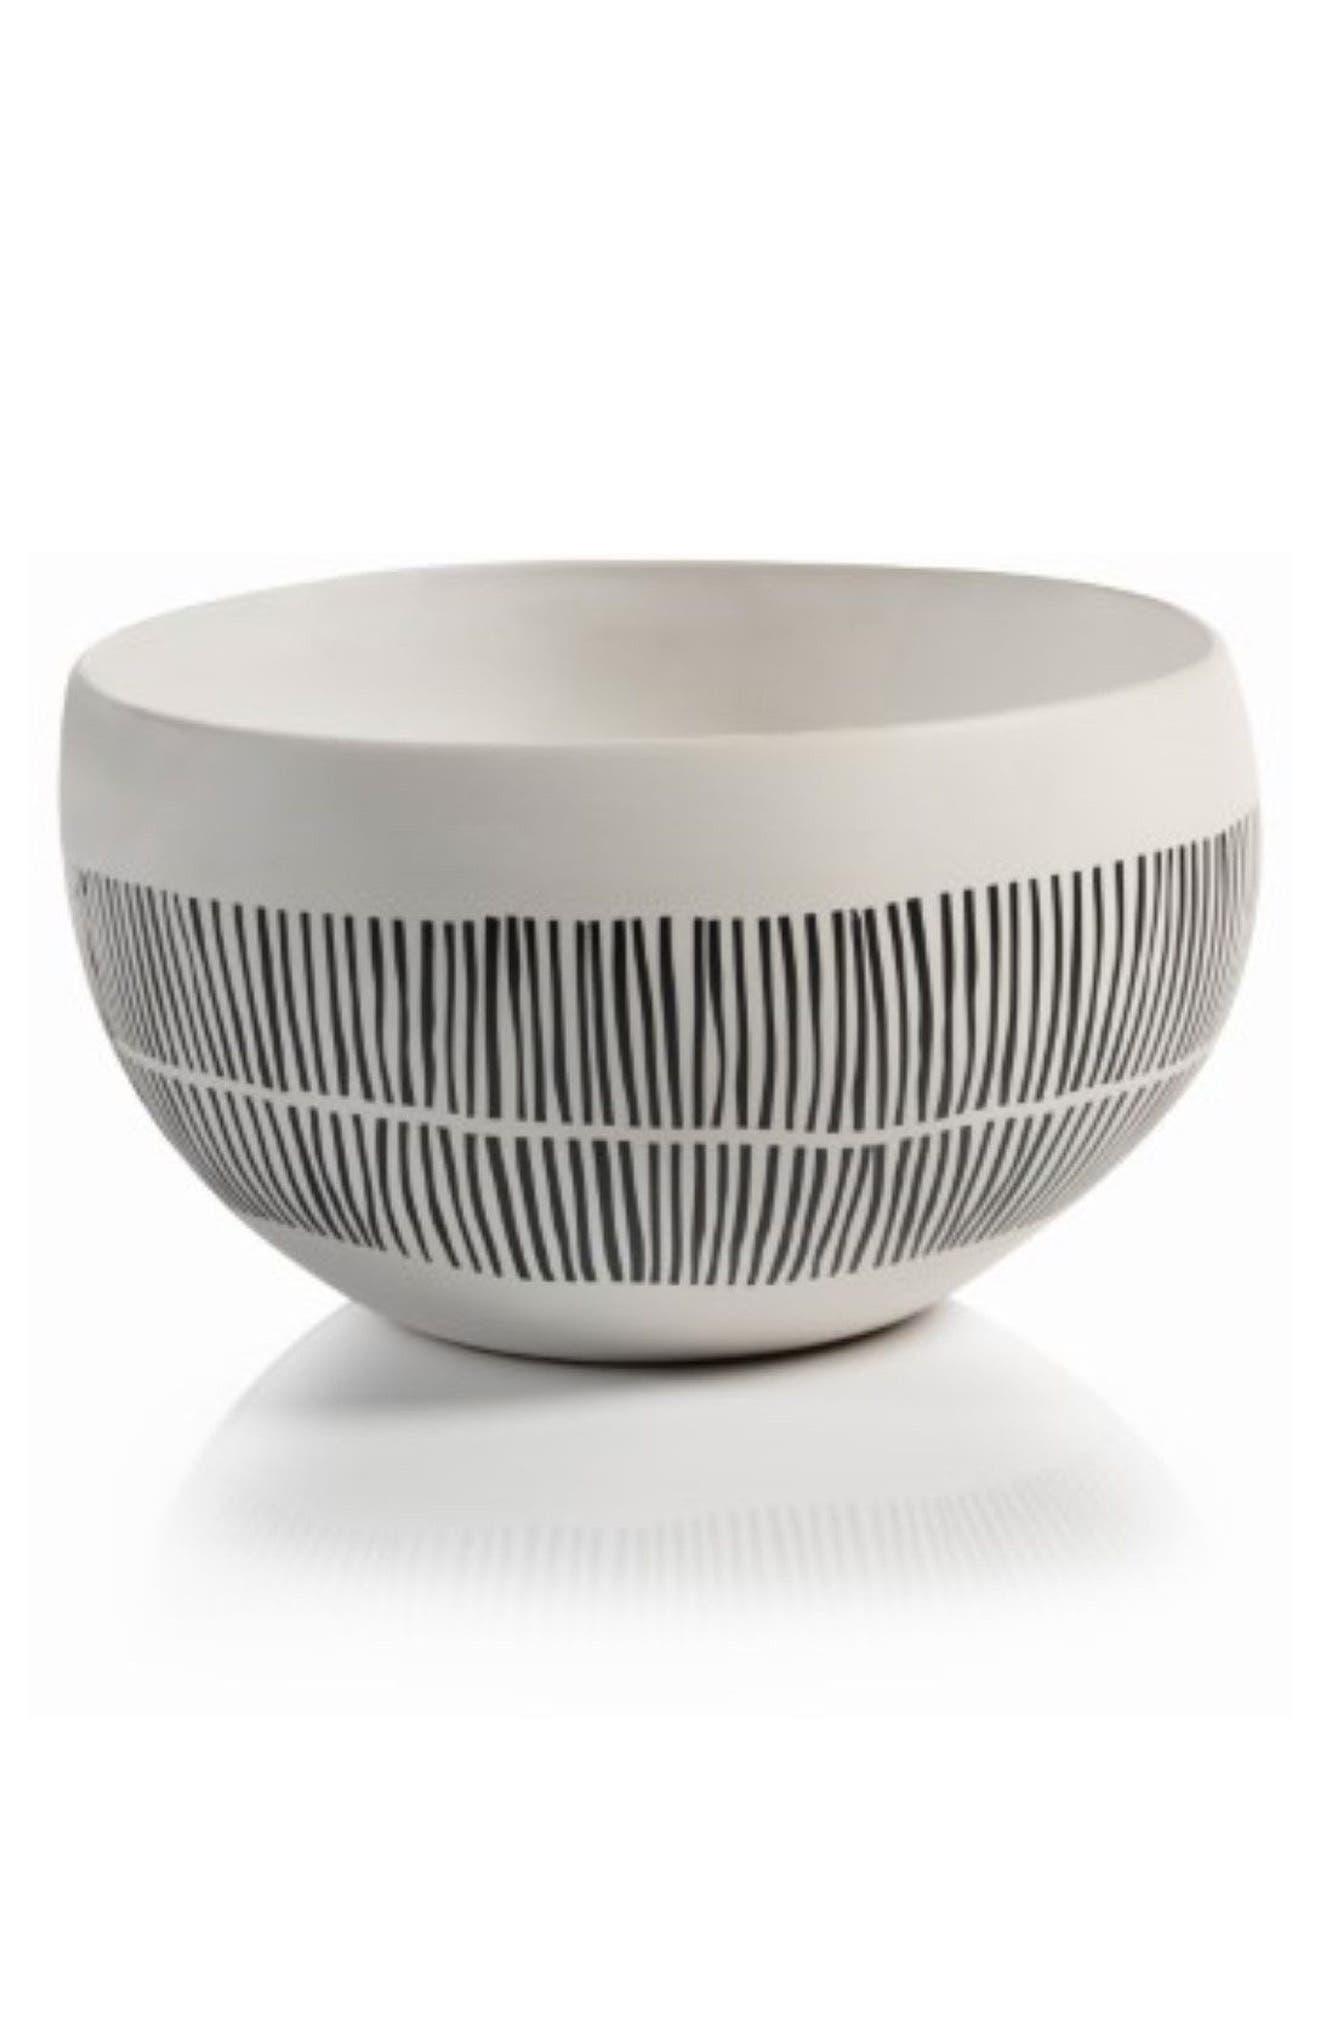 Zodax Marquesa Ceramic Bowl